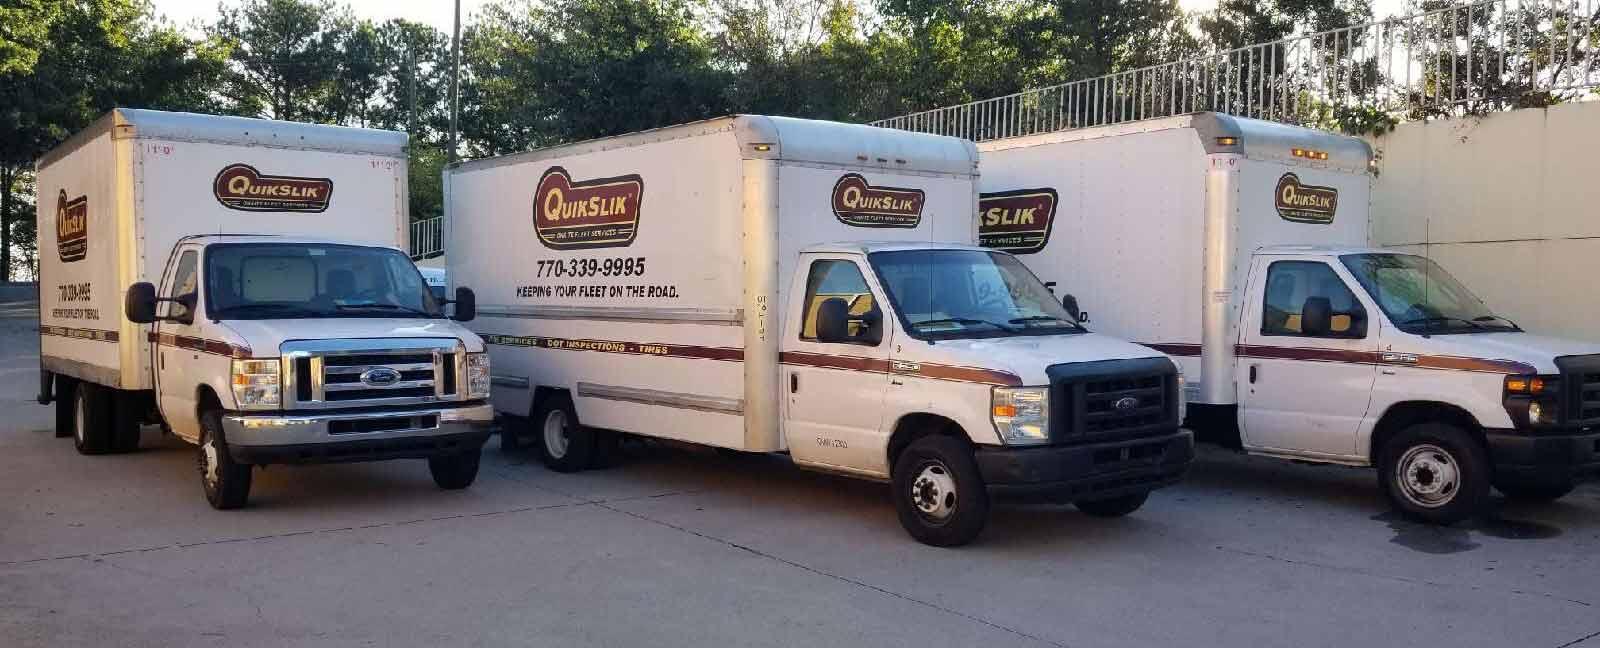 QuikSlik trucks and locations